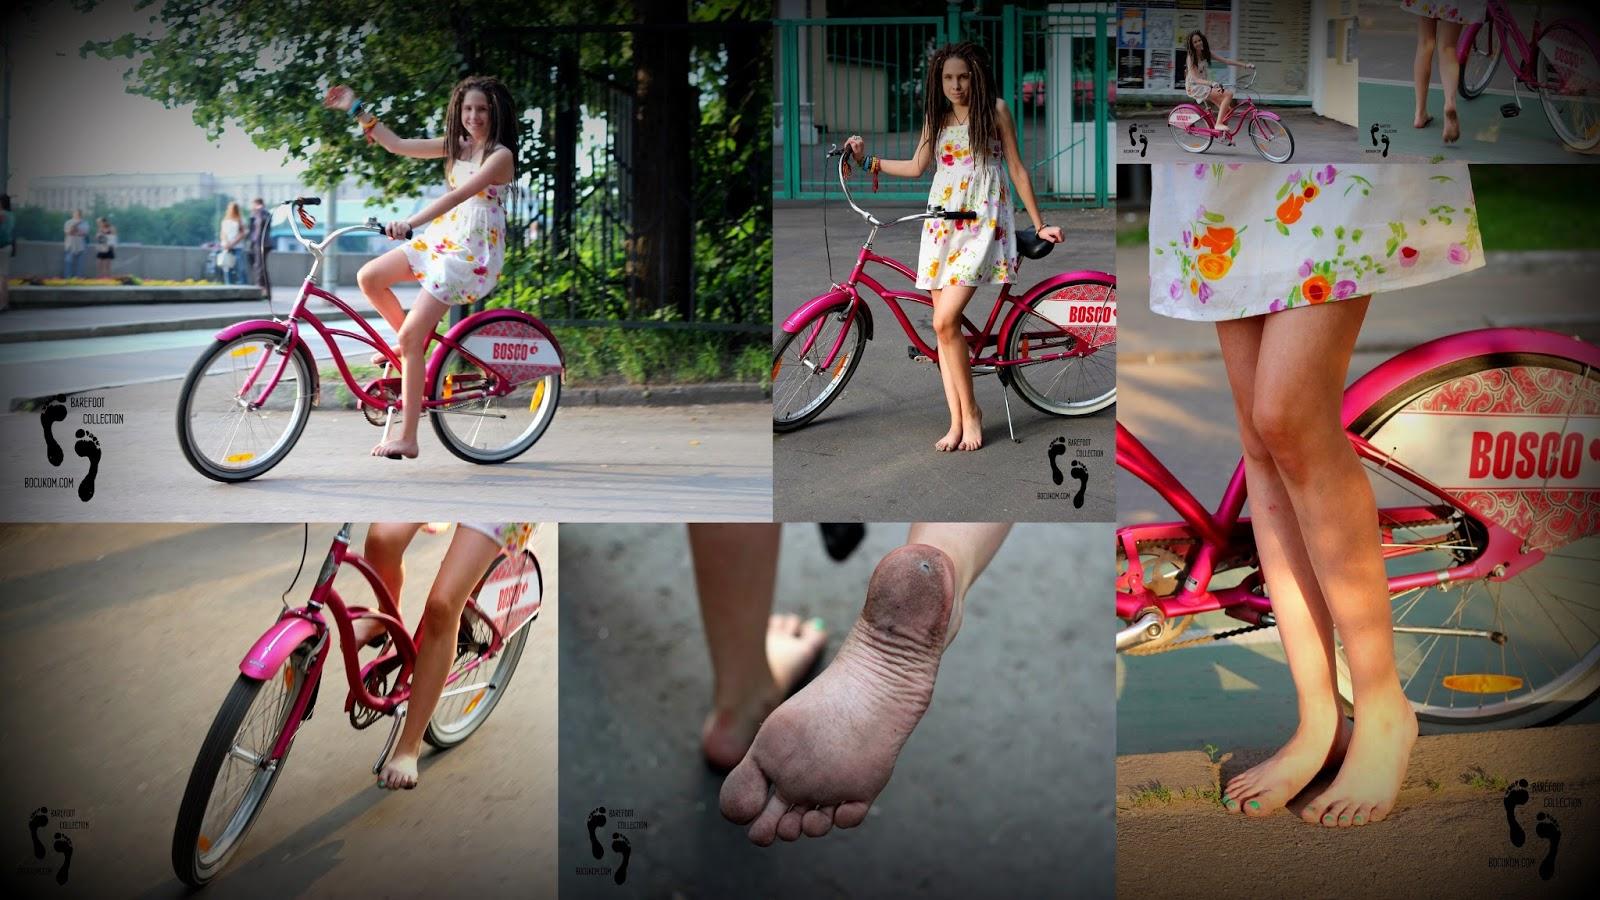 https://1.bp.blogspot.com/-0nhhDBOXd5U/U5ZRfkp3BOI/AAAAAAAAAxk/-RPAWFMF4fU/s1600/Bonus+Content++Elsa++Pacific+Barefoot+Diary%232+by+bocukom-001.jpg